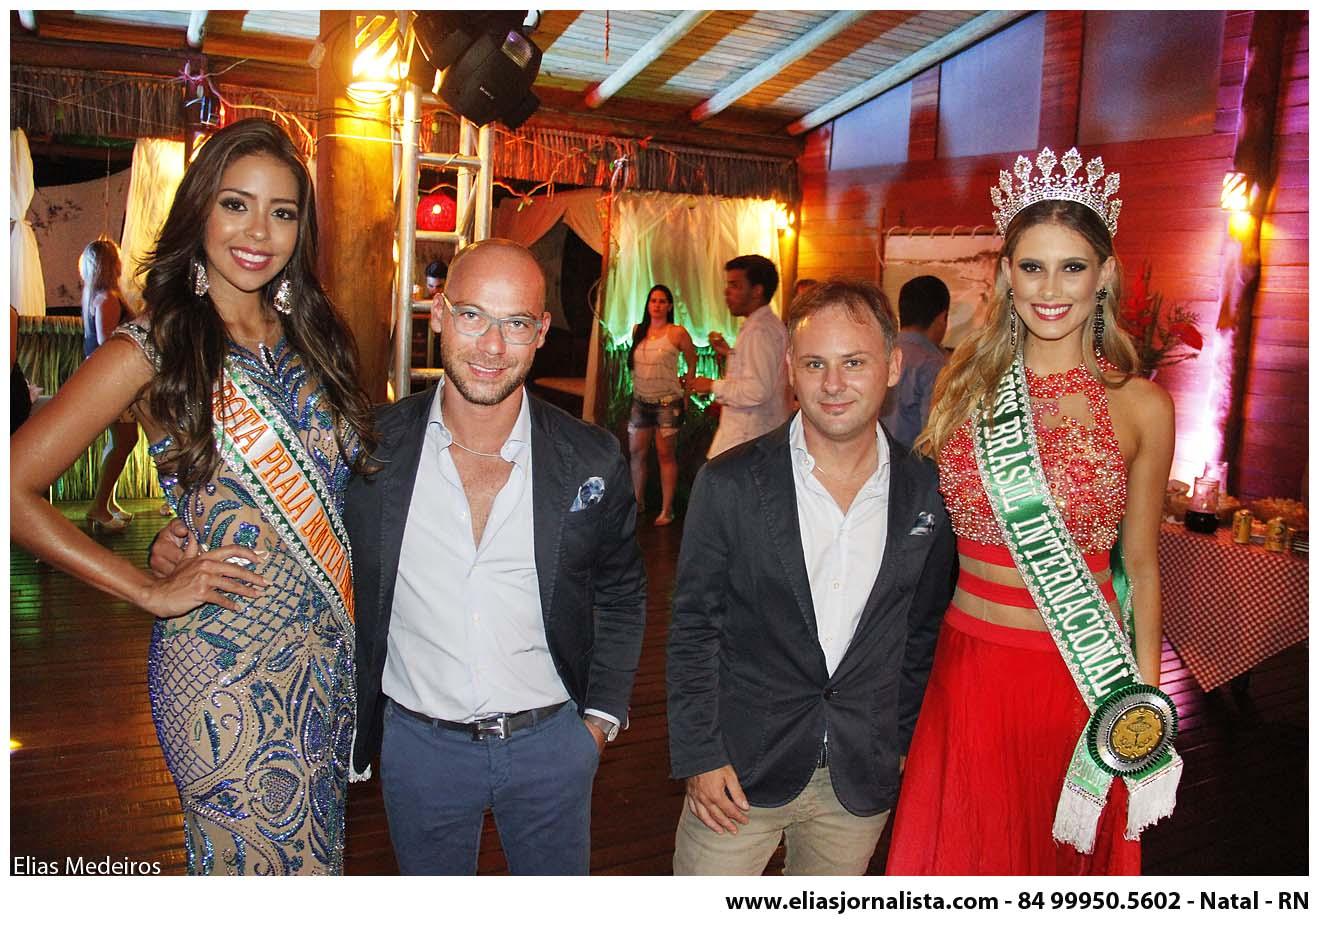 isis stocco, miss brasil internacional 2015. - Página 4 6bobbzb2